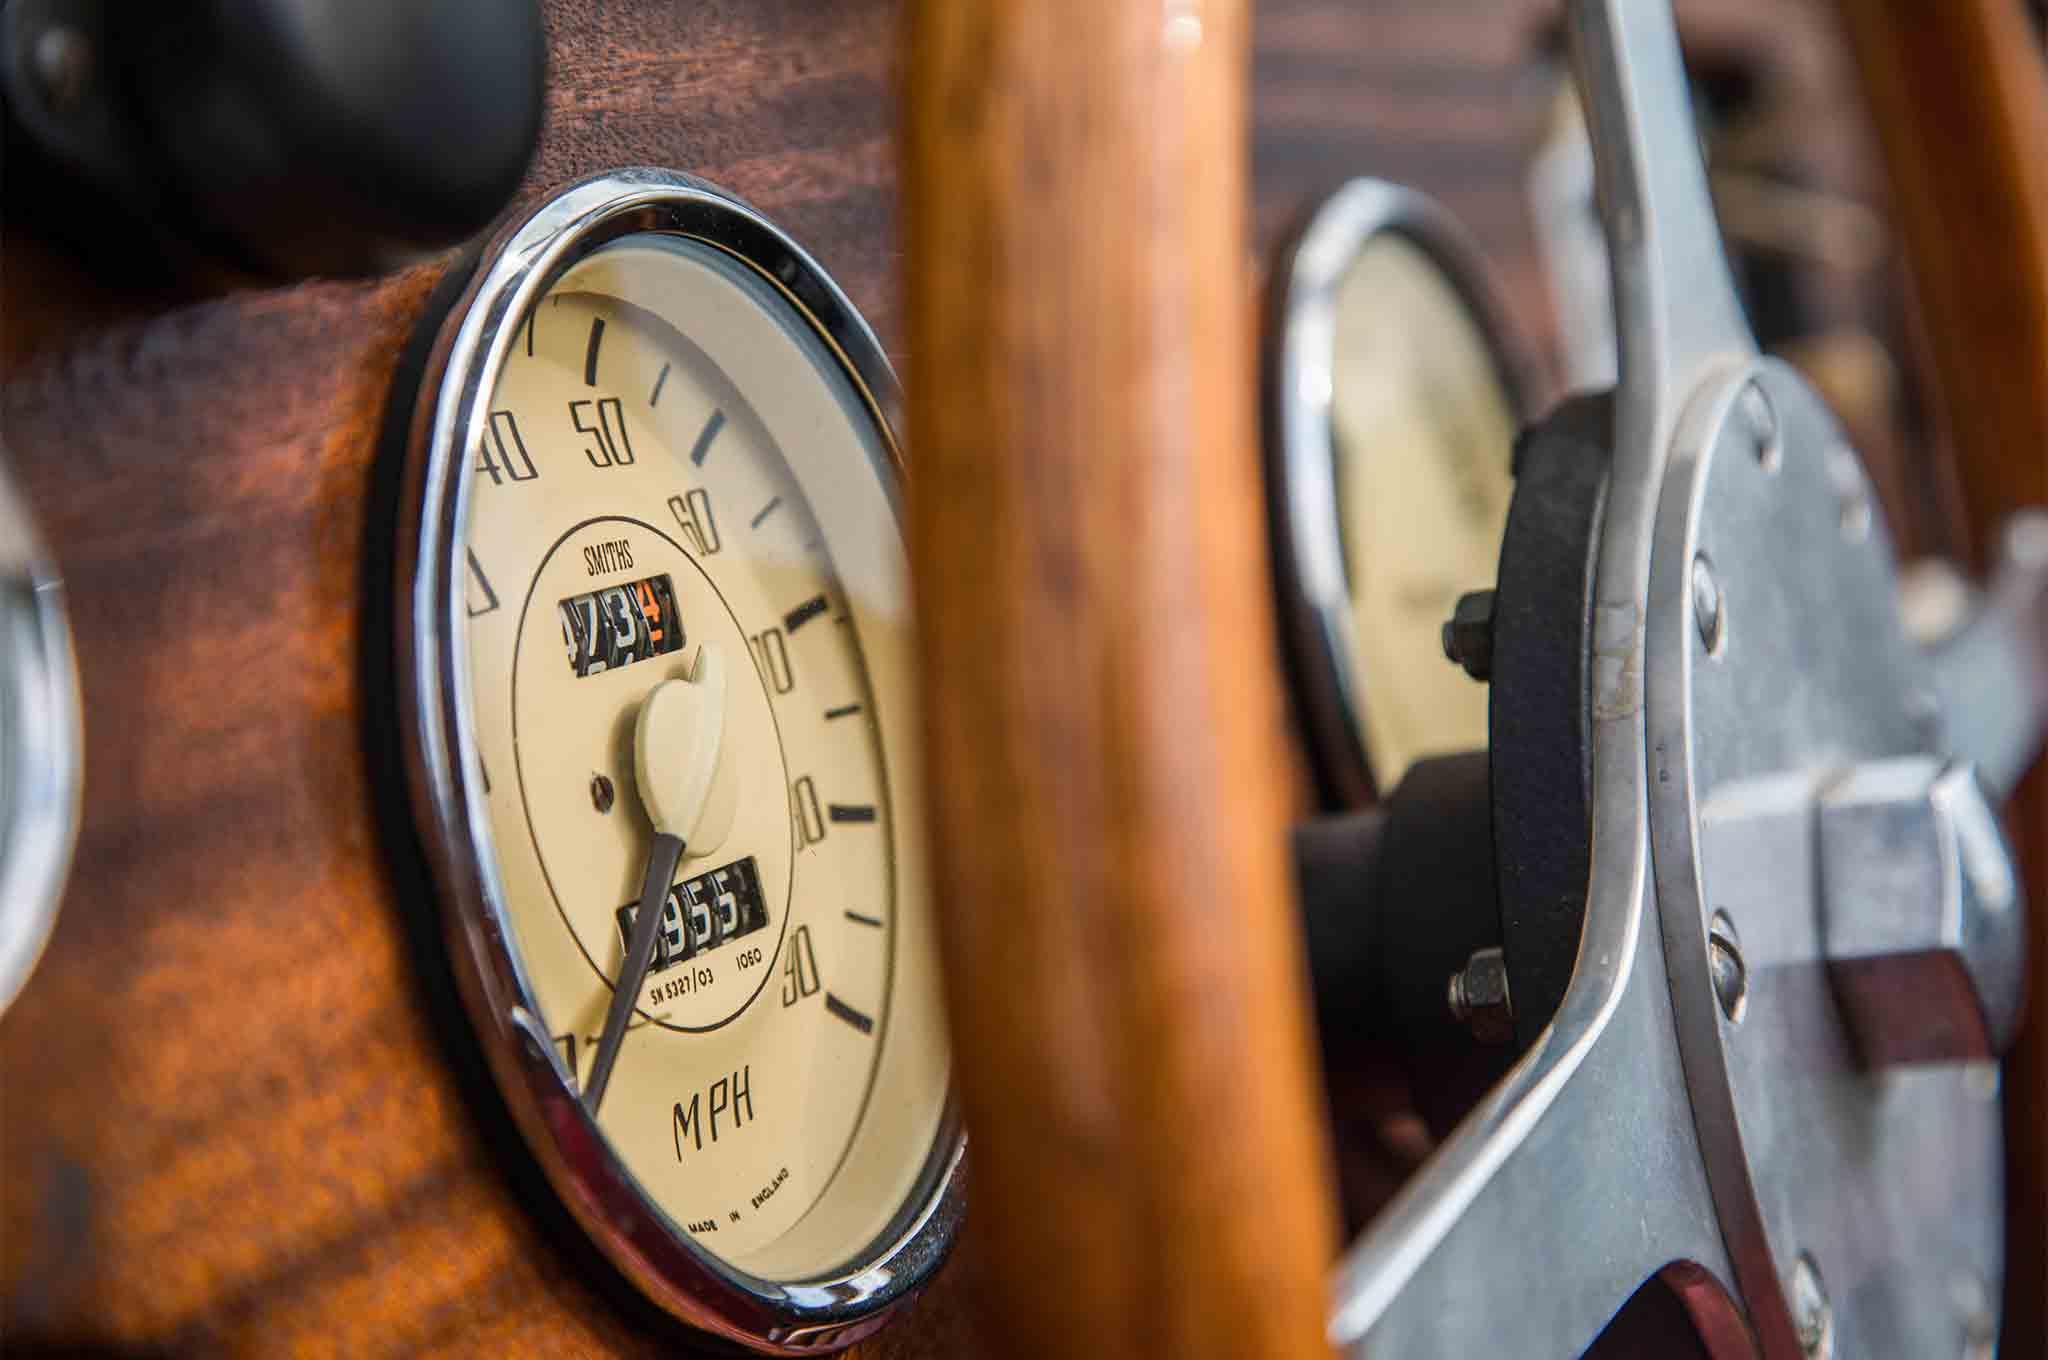 1963 Morgan 4 4 Dashboard Gauge 02